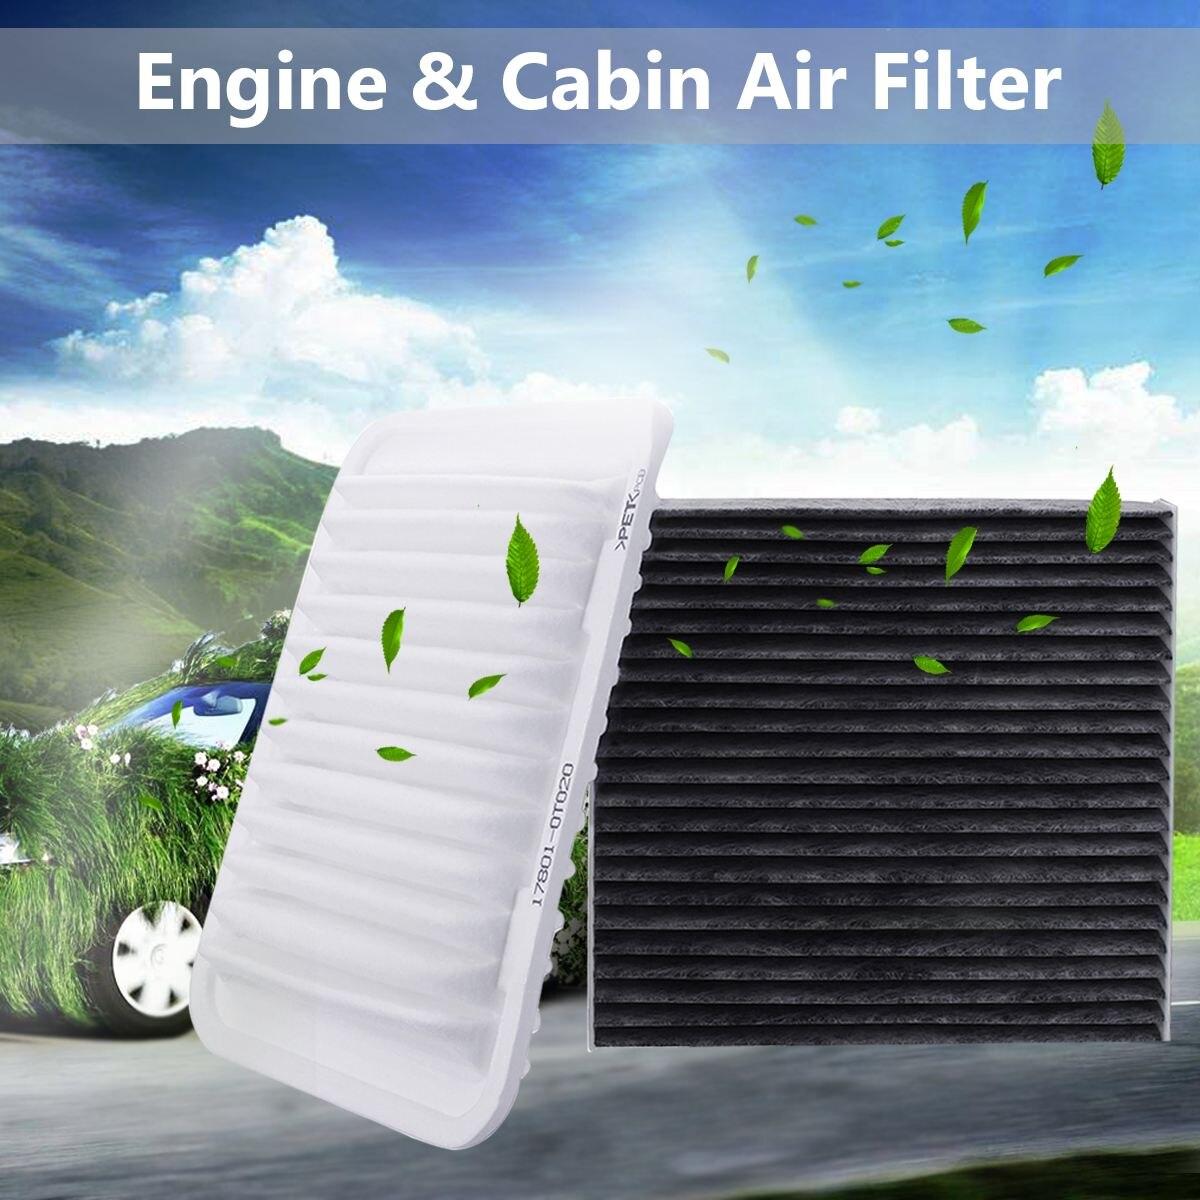 2006-2012 Toyota//Lexus//Scion Rigid Panel Engine Air Filter for Camry 2009-2015 EPAuto GP169 ,tC 2007-2012 Matrix CA10169 Venza 2011-2016 RAV4 2007-2011 2009-2013 ,Avalon 2005-2012 ,ES350